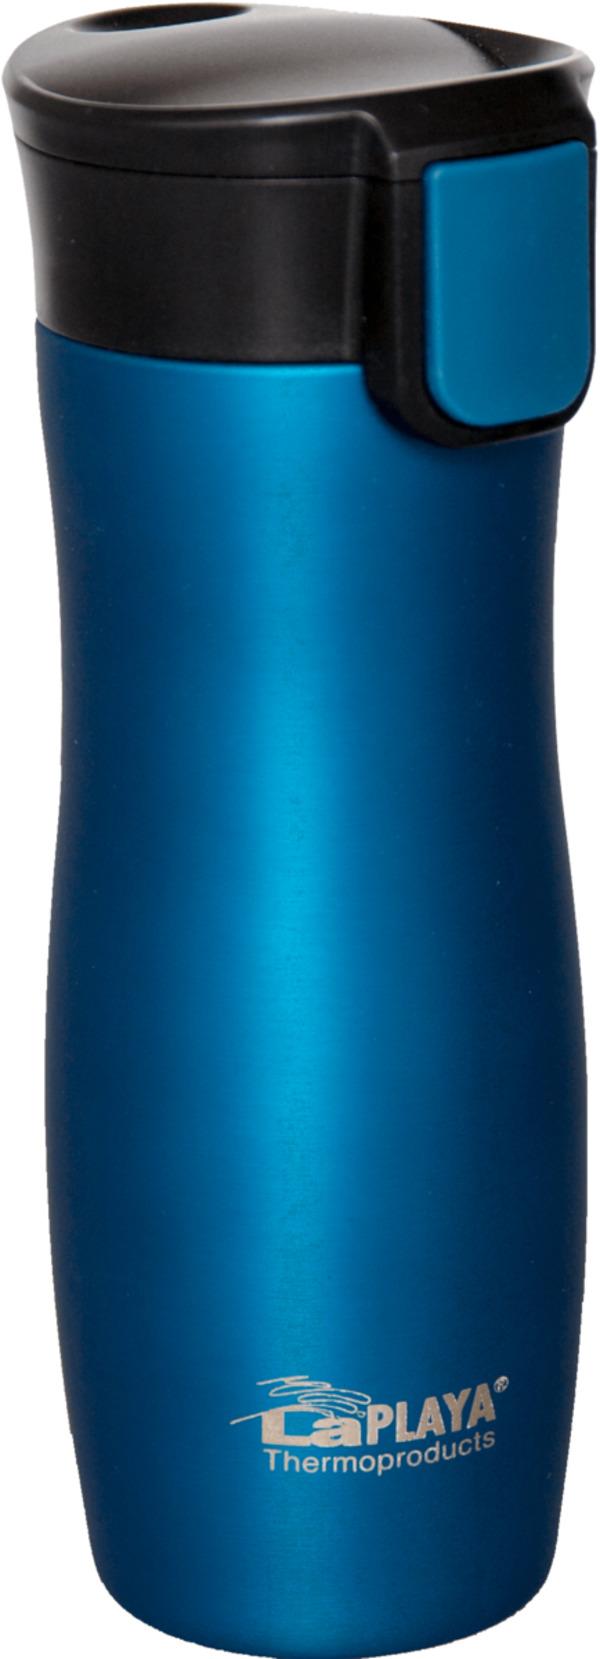 LaPLAYA One Hand Thermobecher 0,38 L blau